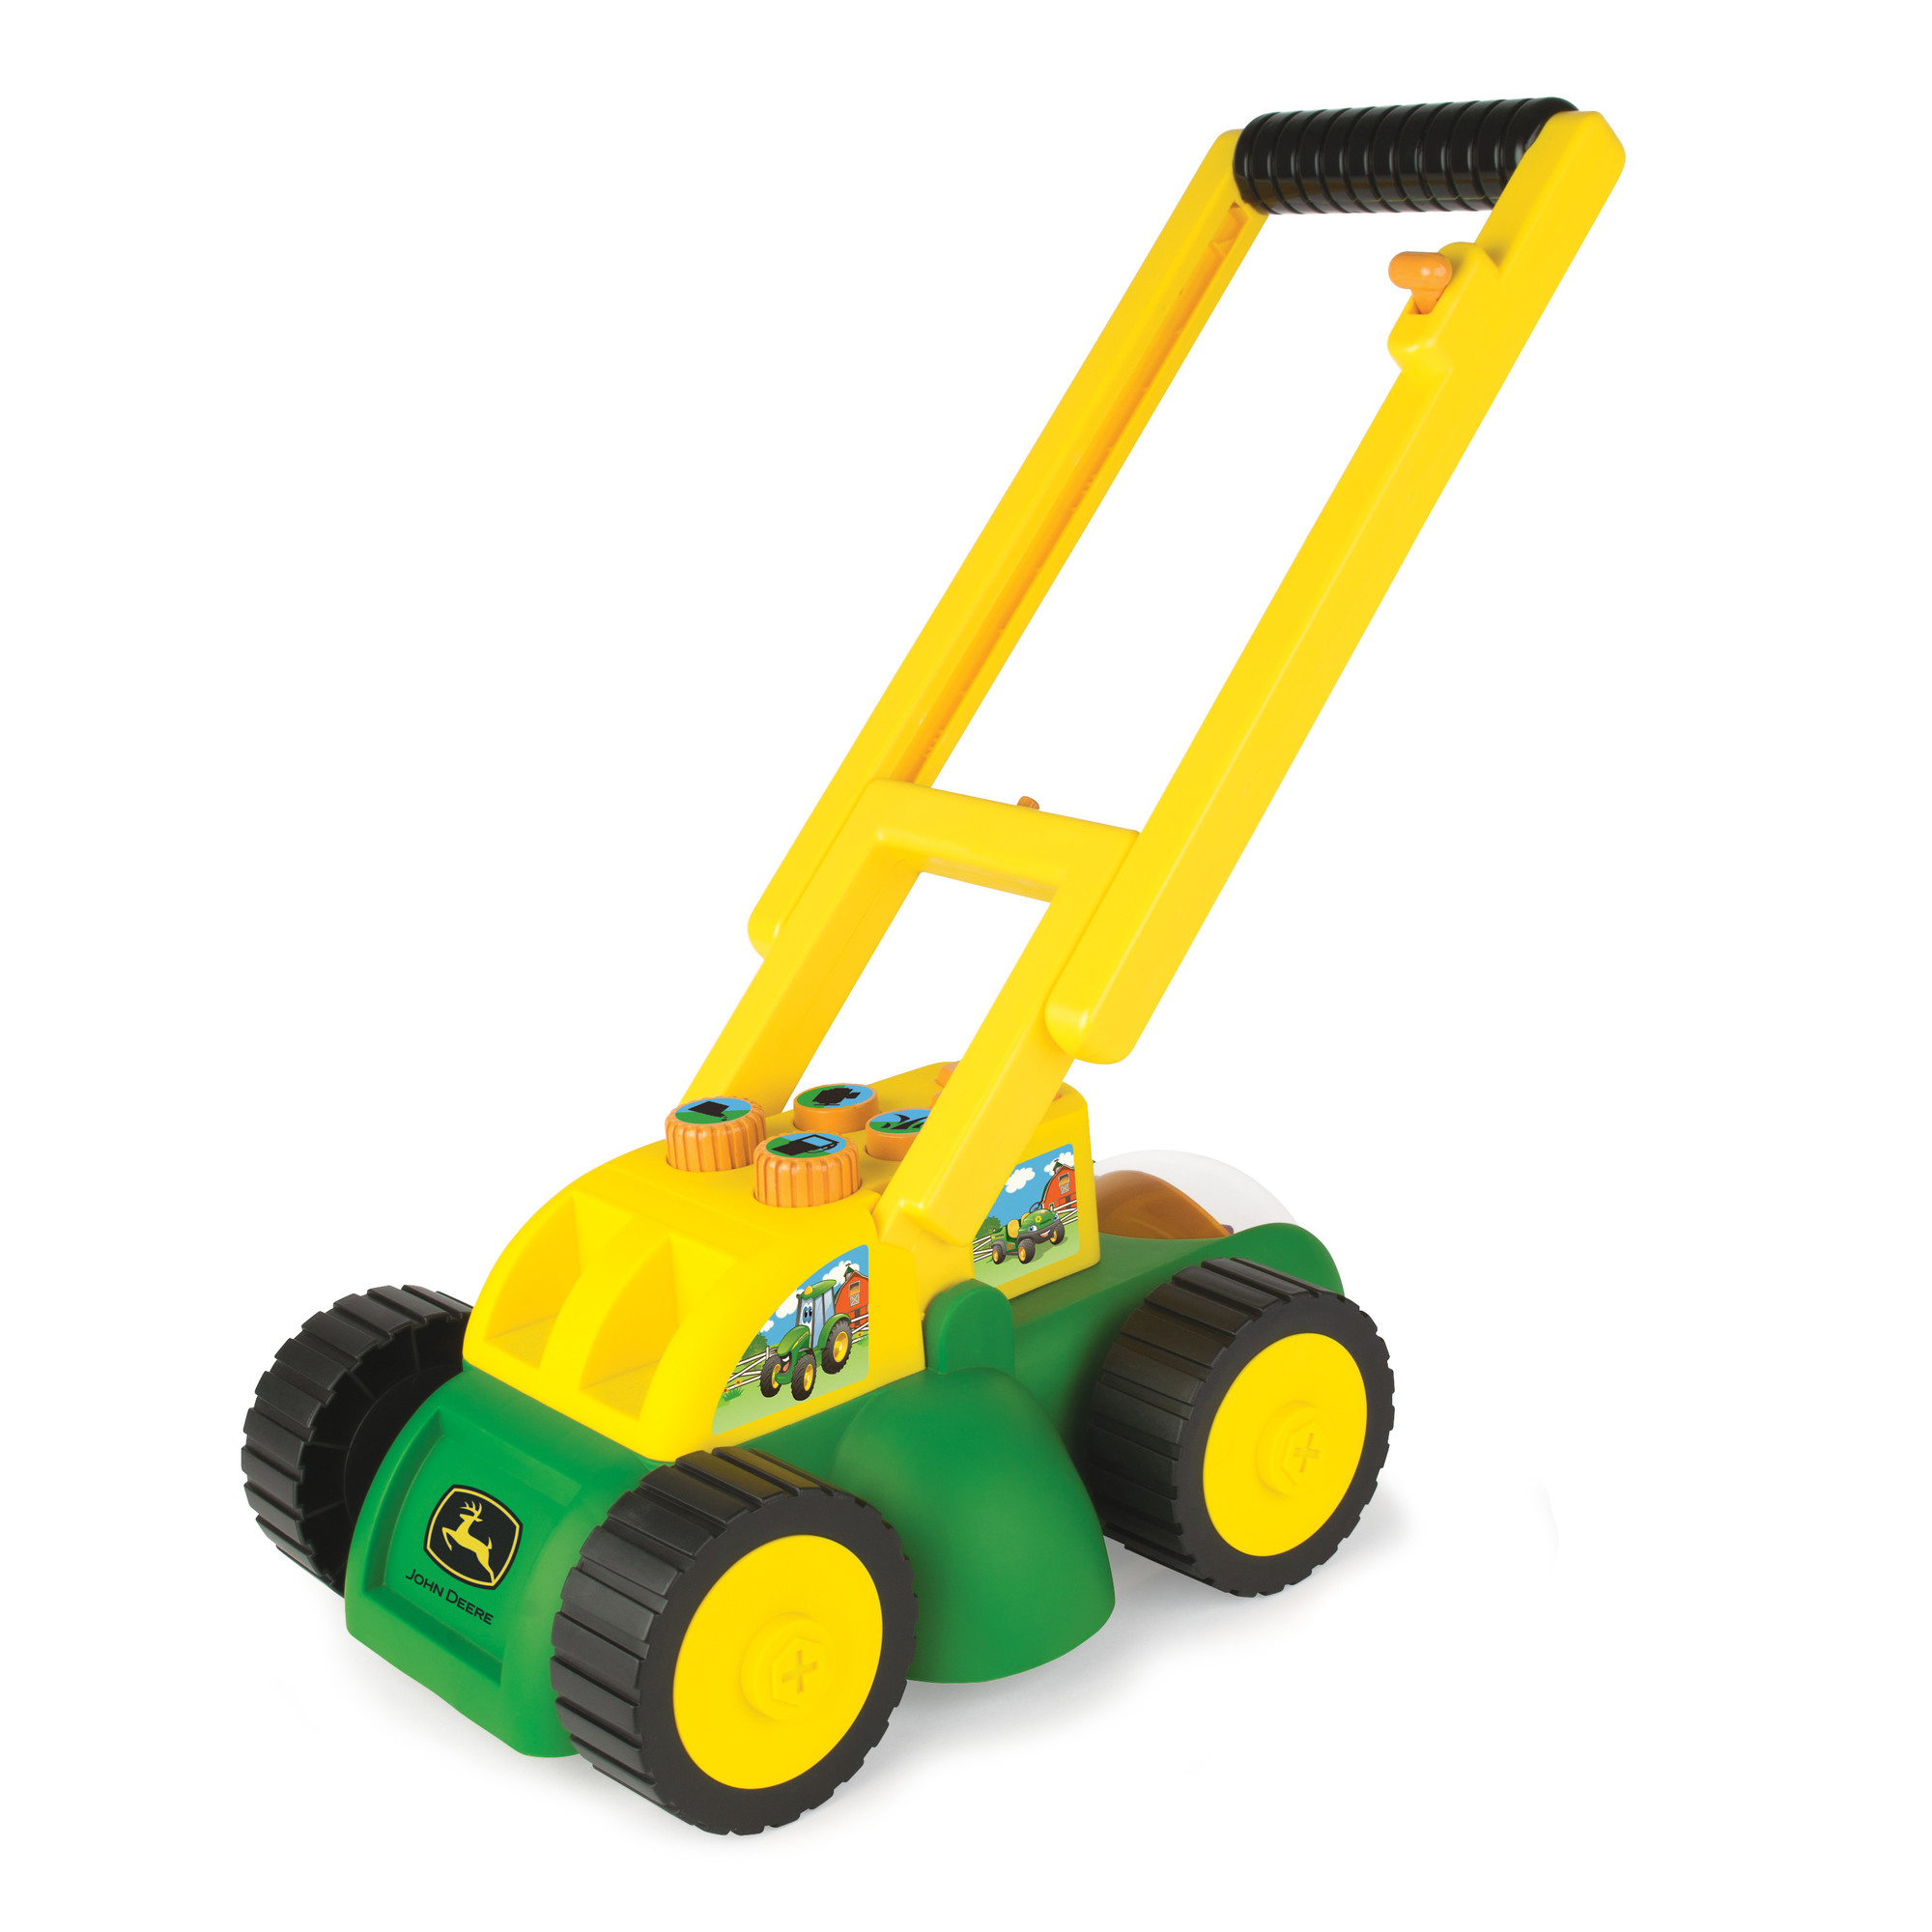 Tomy - John Deere Real Sounds Lawn Mower